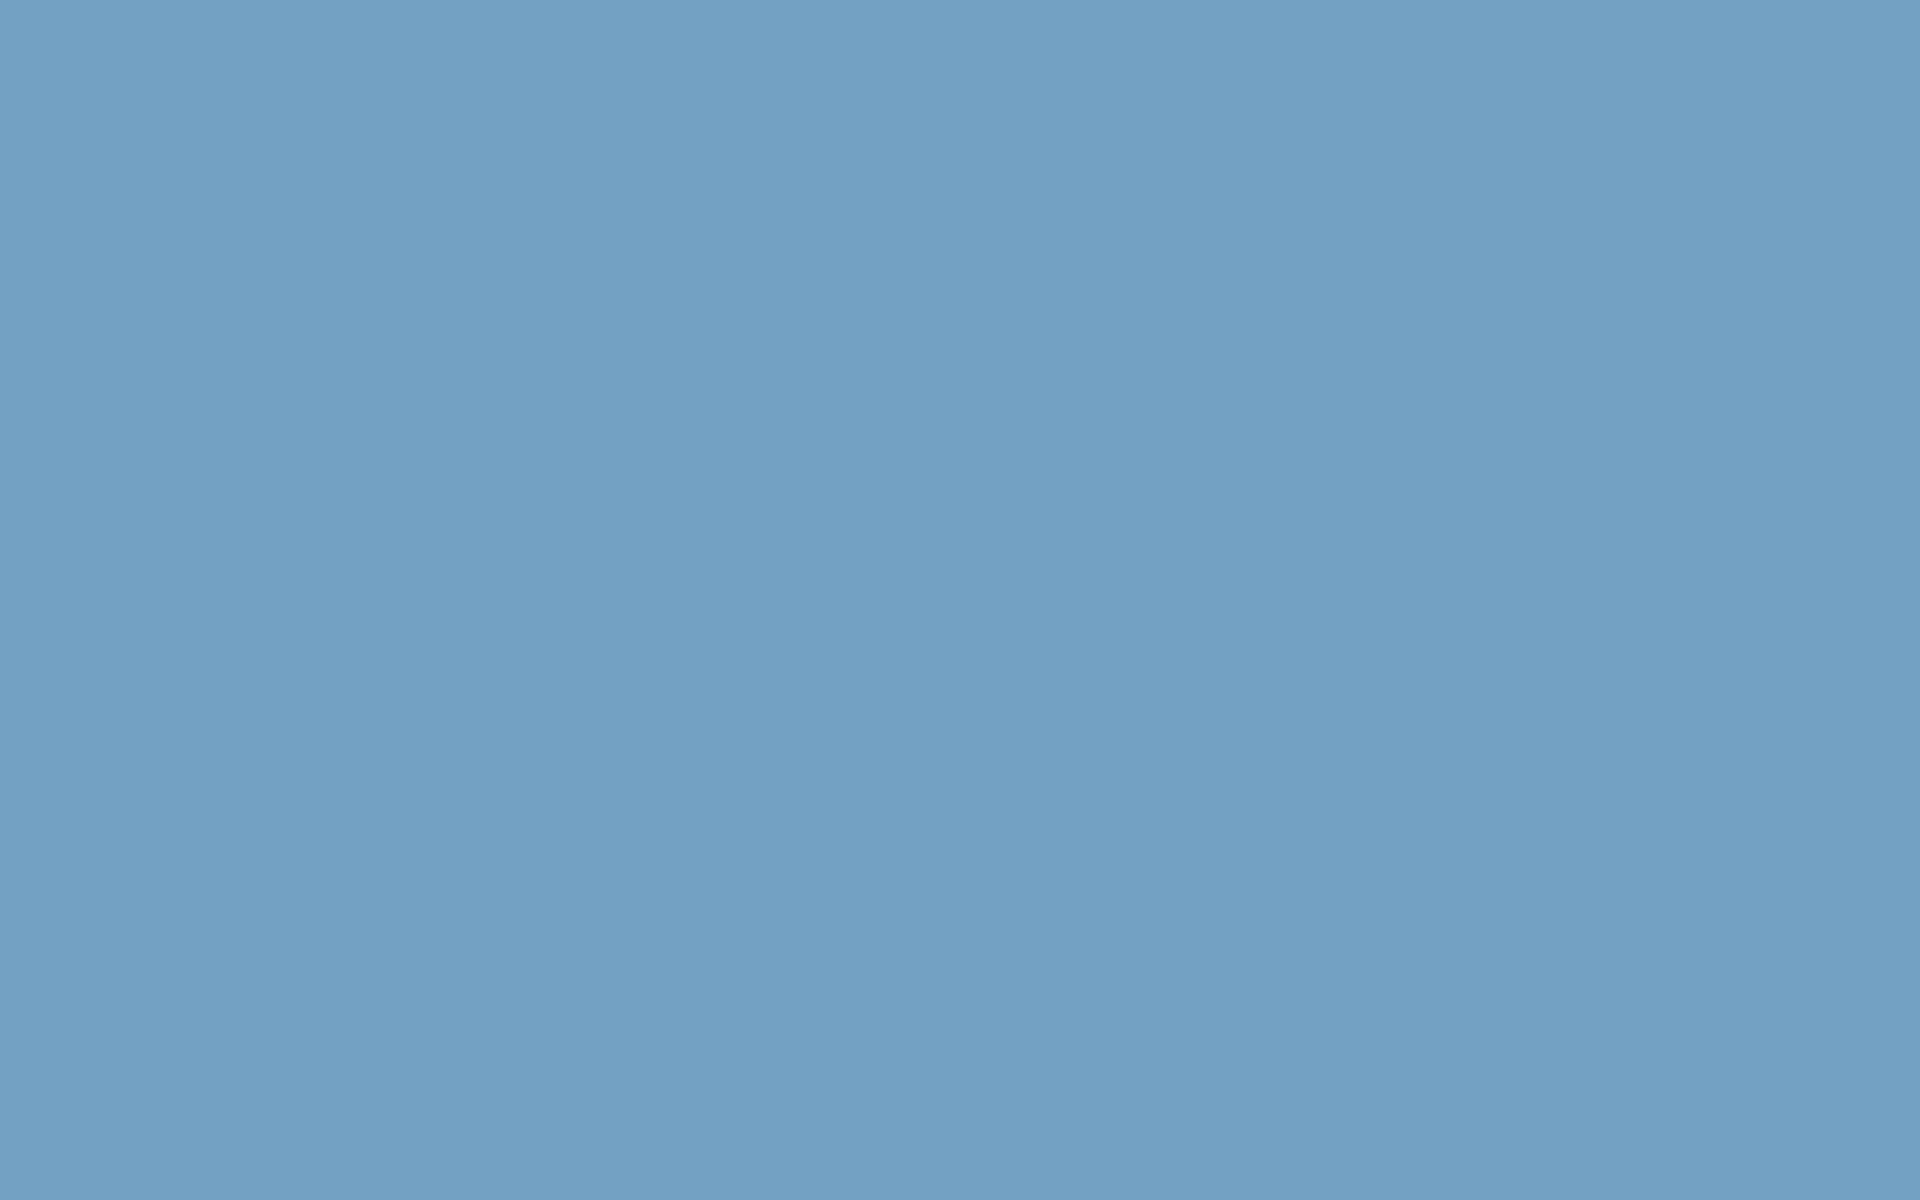 15+ plain blue backgrounds | wallpapers | freecreatives